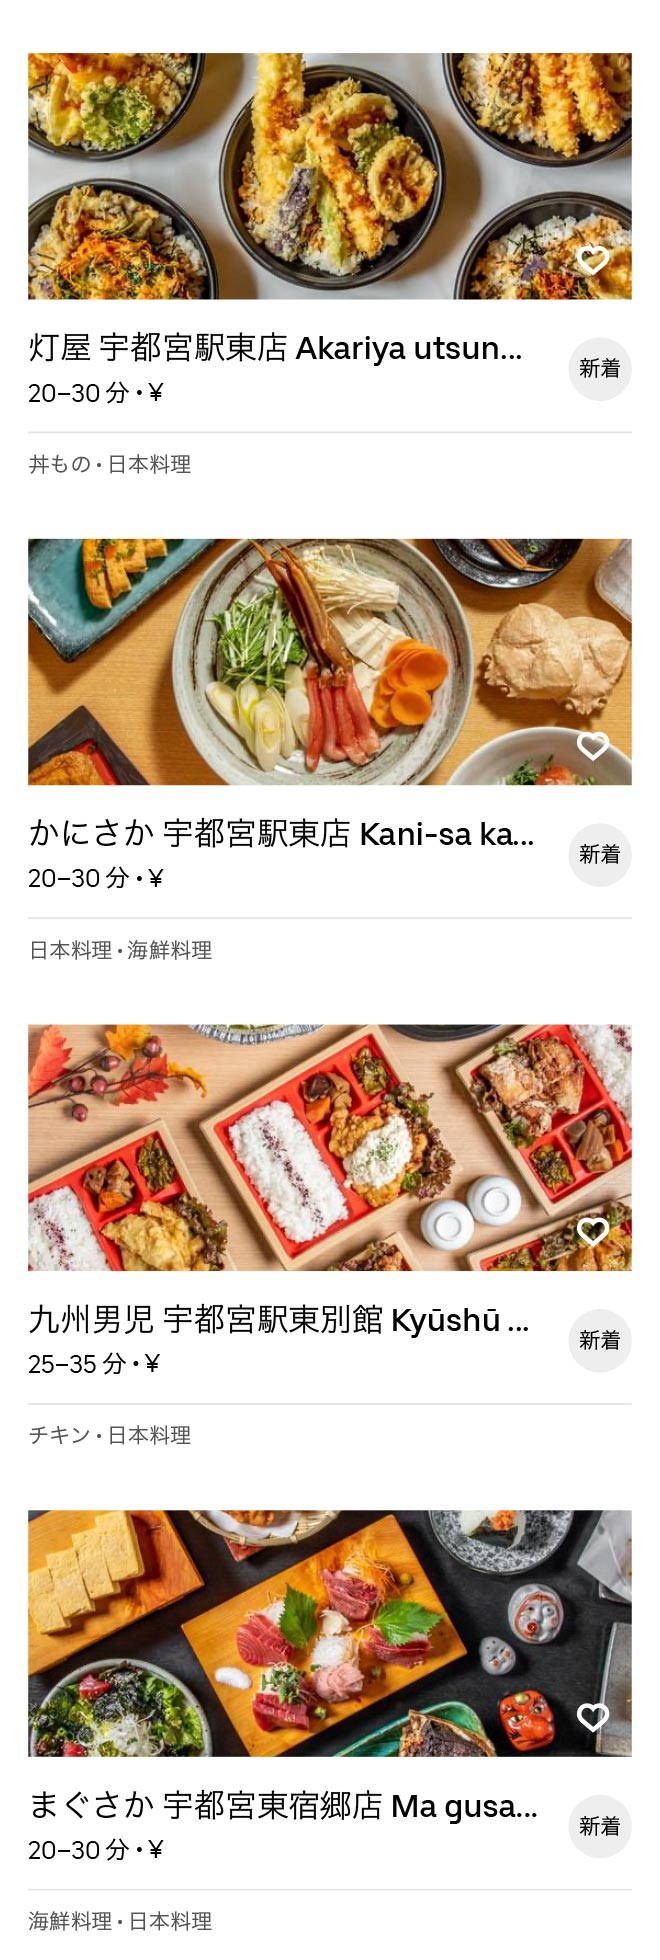 Utsunomiya menu 200611